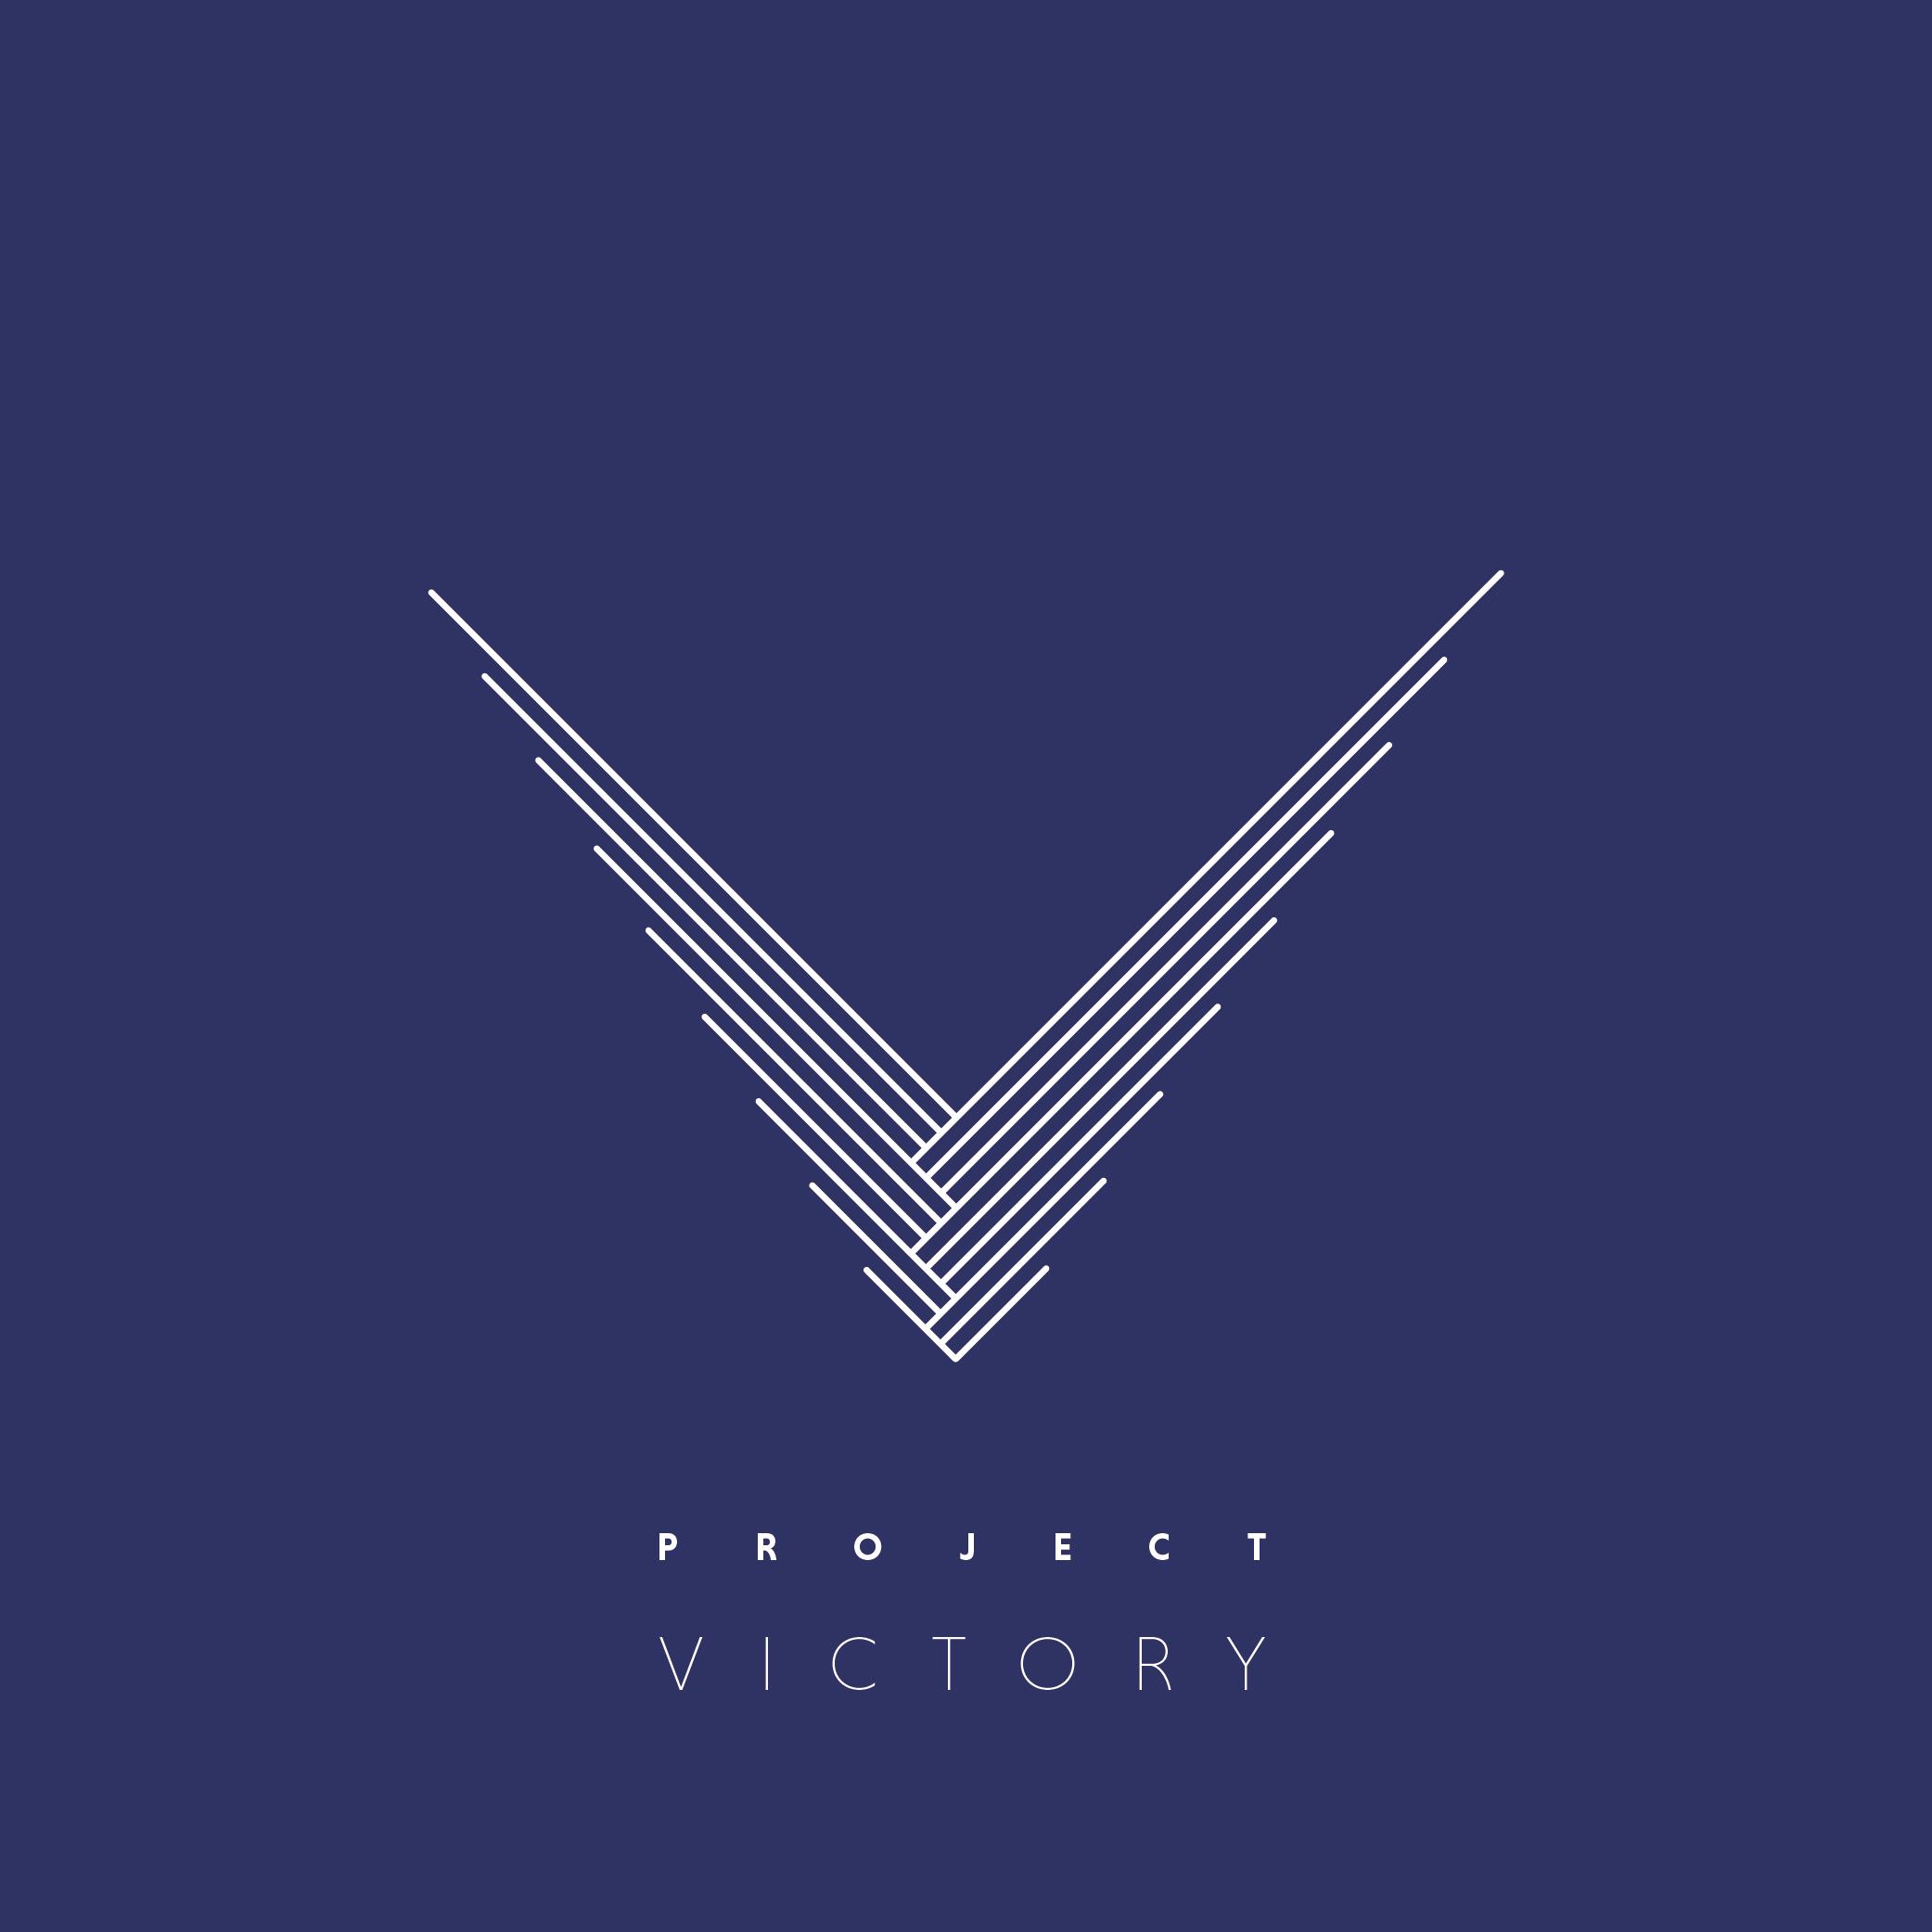 project_victory_branding_logo_04